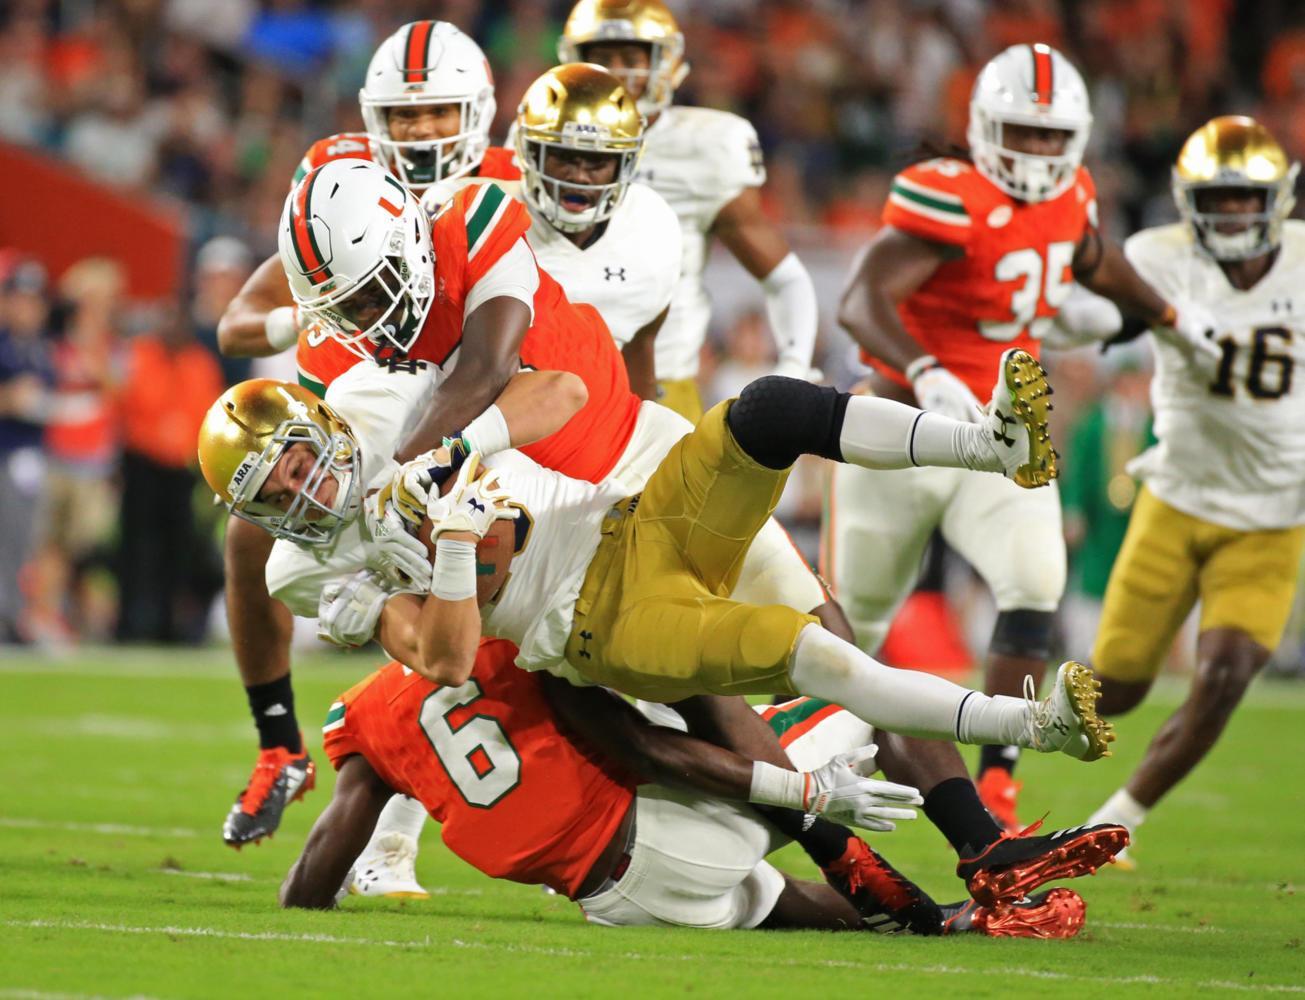 Miami Hurricanes' DeeJay Dallas (13) takes down Notre Dame Fighting Irish wide receiver Chris Finke (10) on a punt return in the first quarter Saturday, Nov. 11, 2017 at Hard Rock Stadium in Miami Gardens, Florida. (Al Diaz/Miami Herald/TNS)